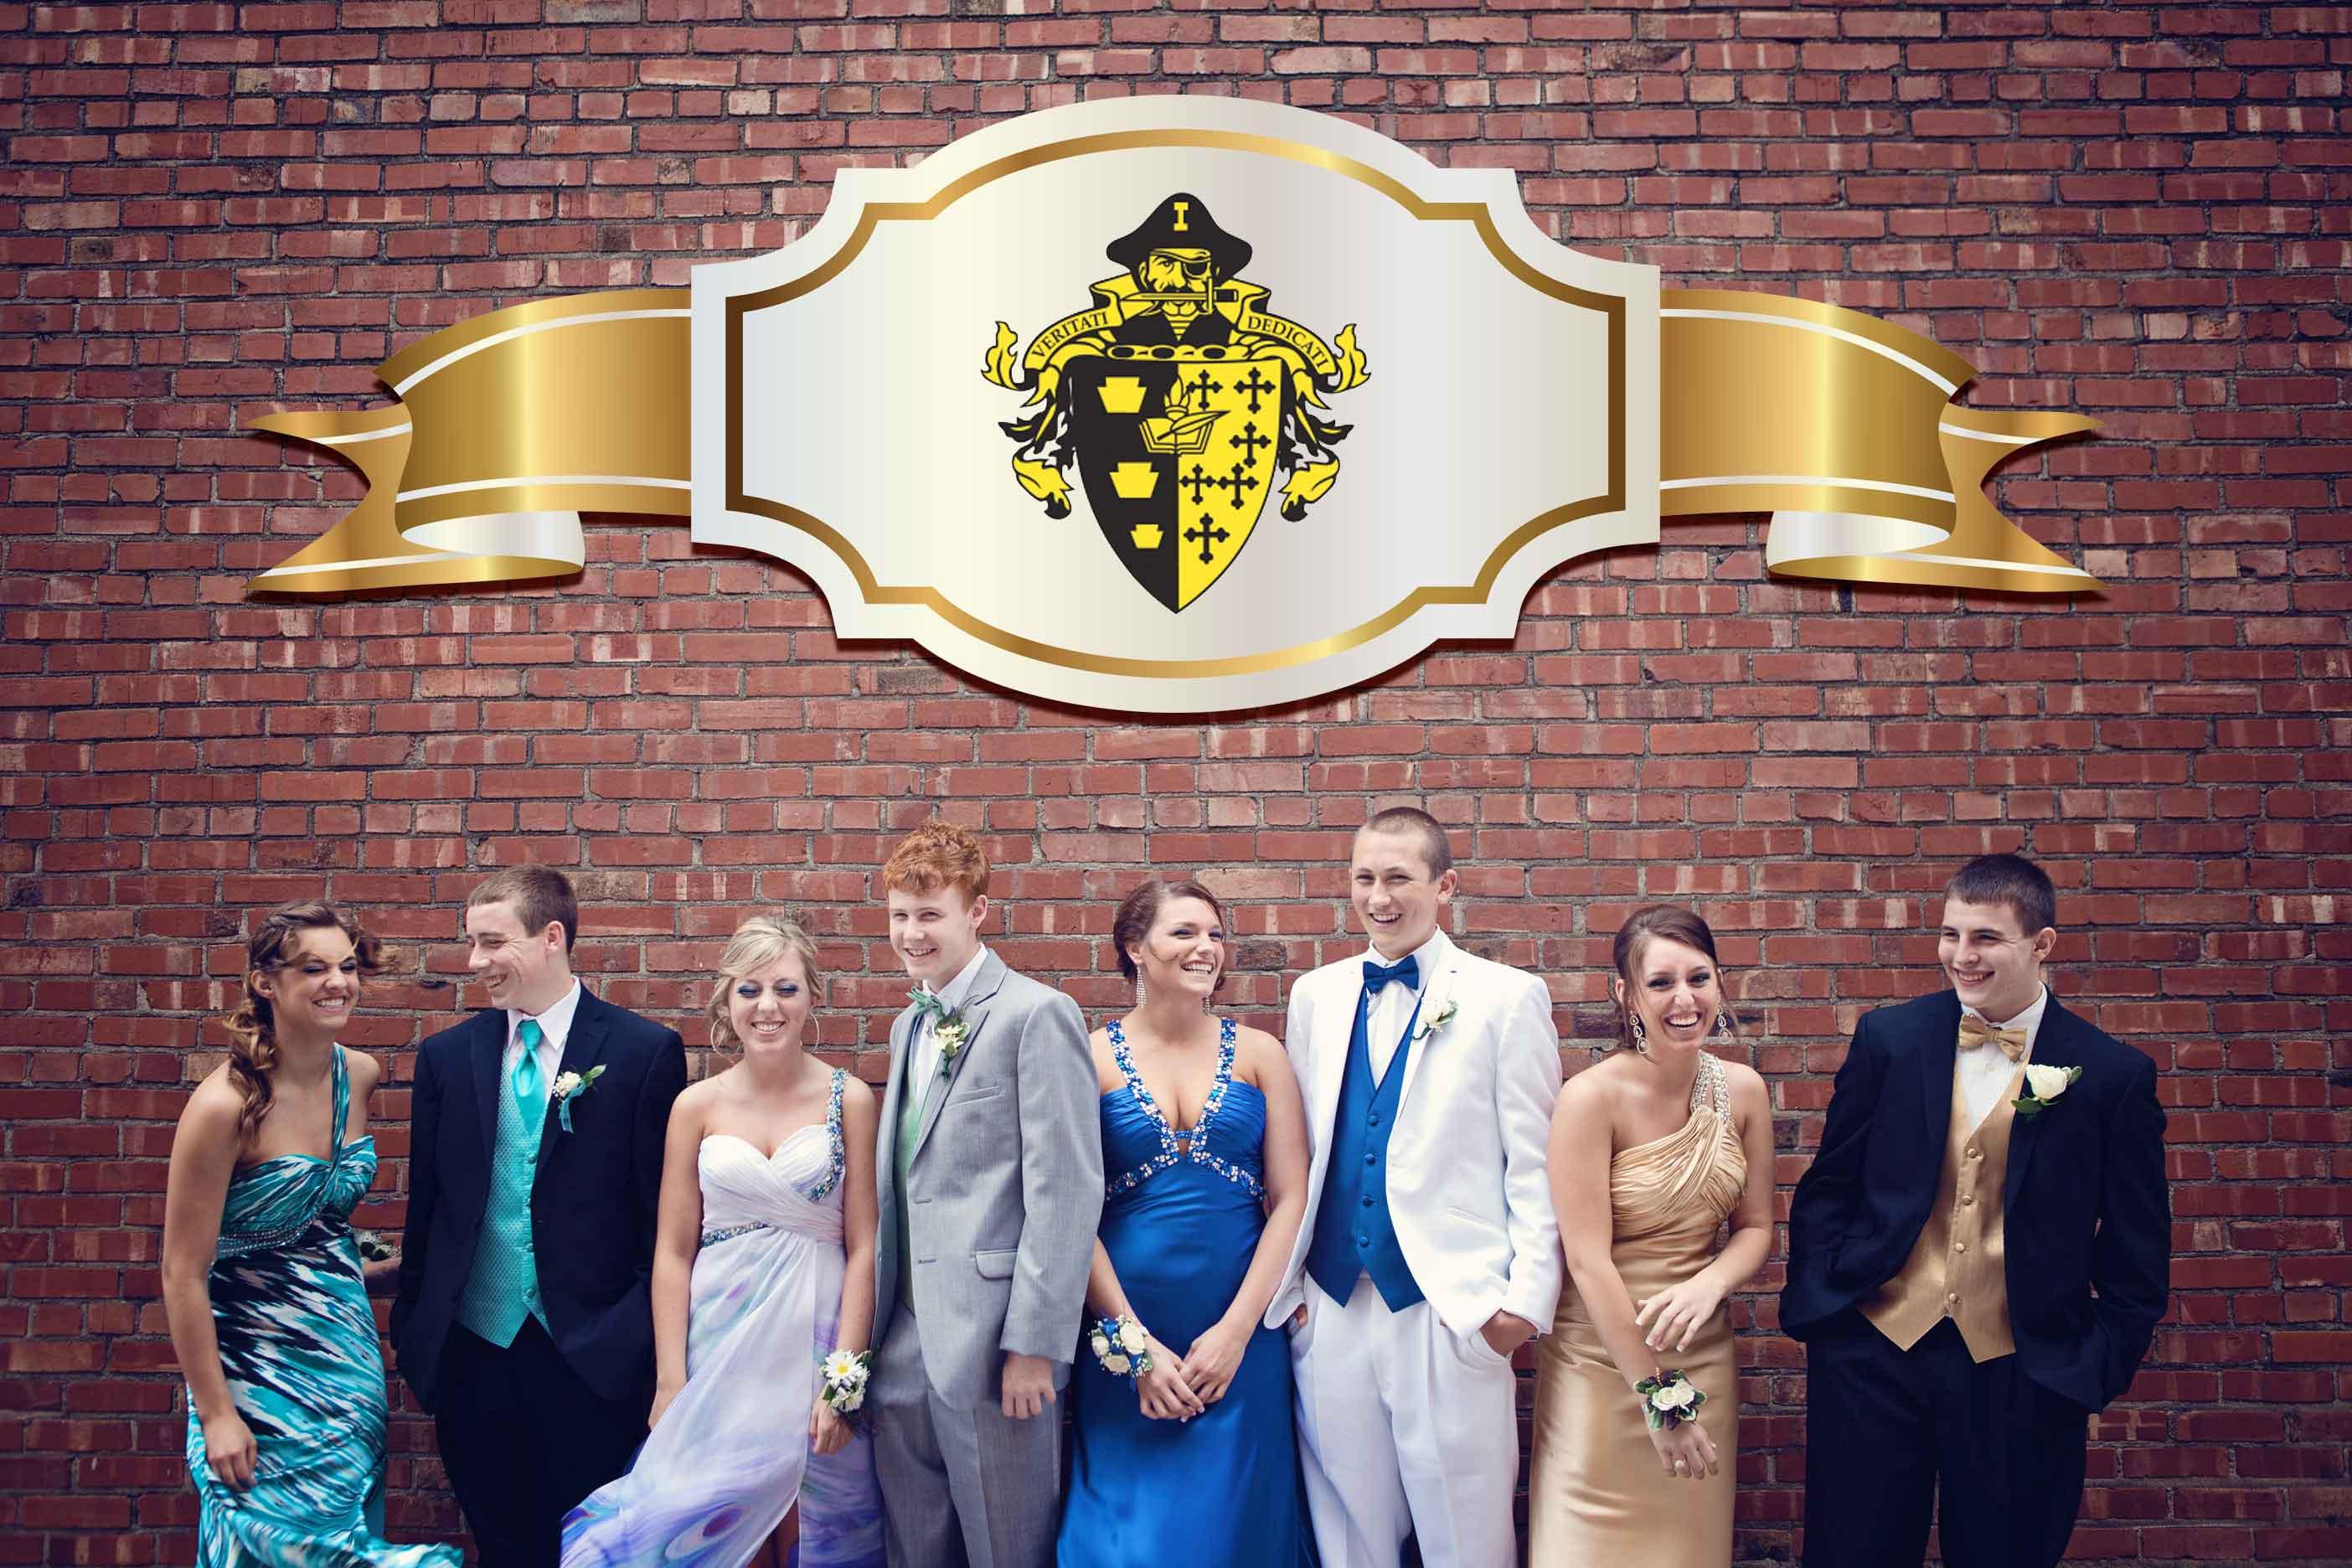 interboro high school prom